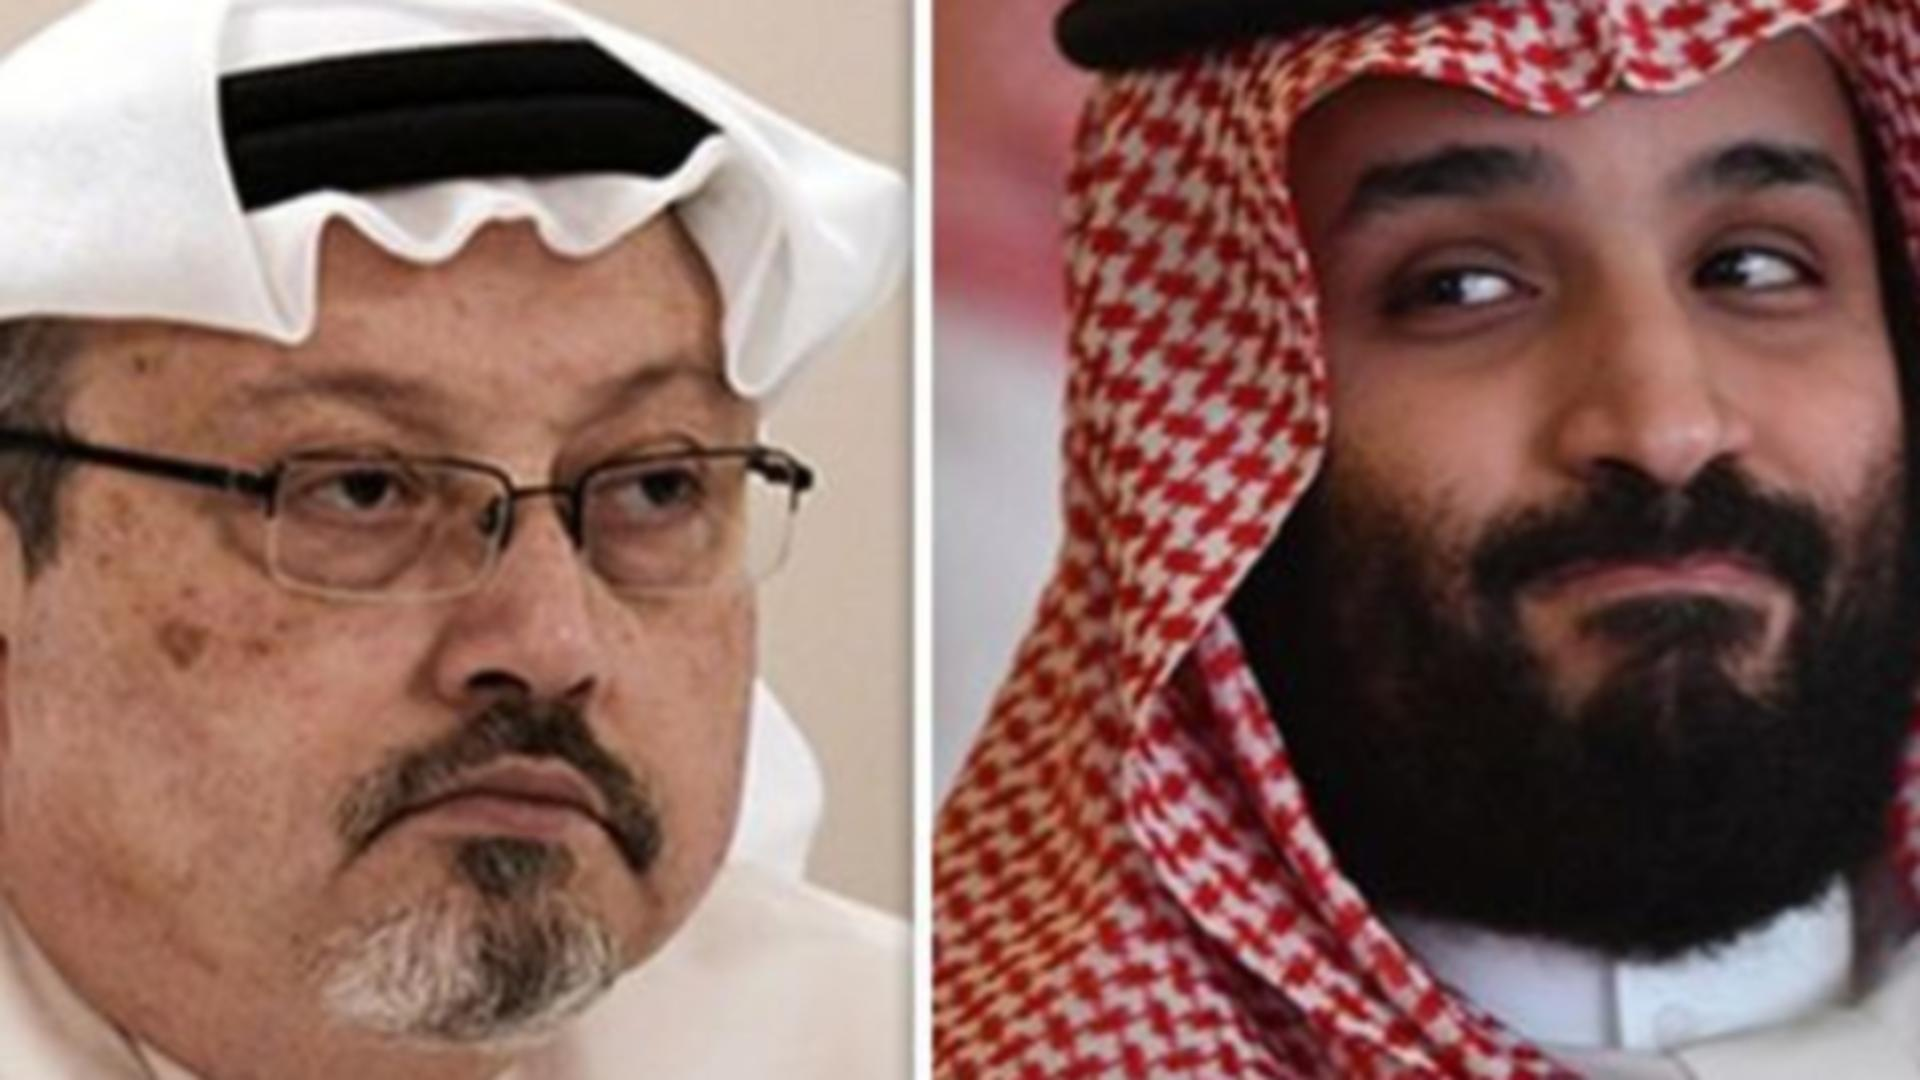 Jurnalistul saudit Jamal Khashoggi, asainat în 2018, și prințul moștenitor Mohammad bin Salman Foto: express.co.uk